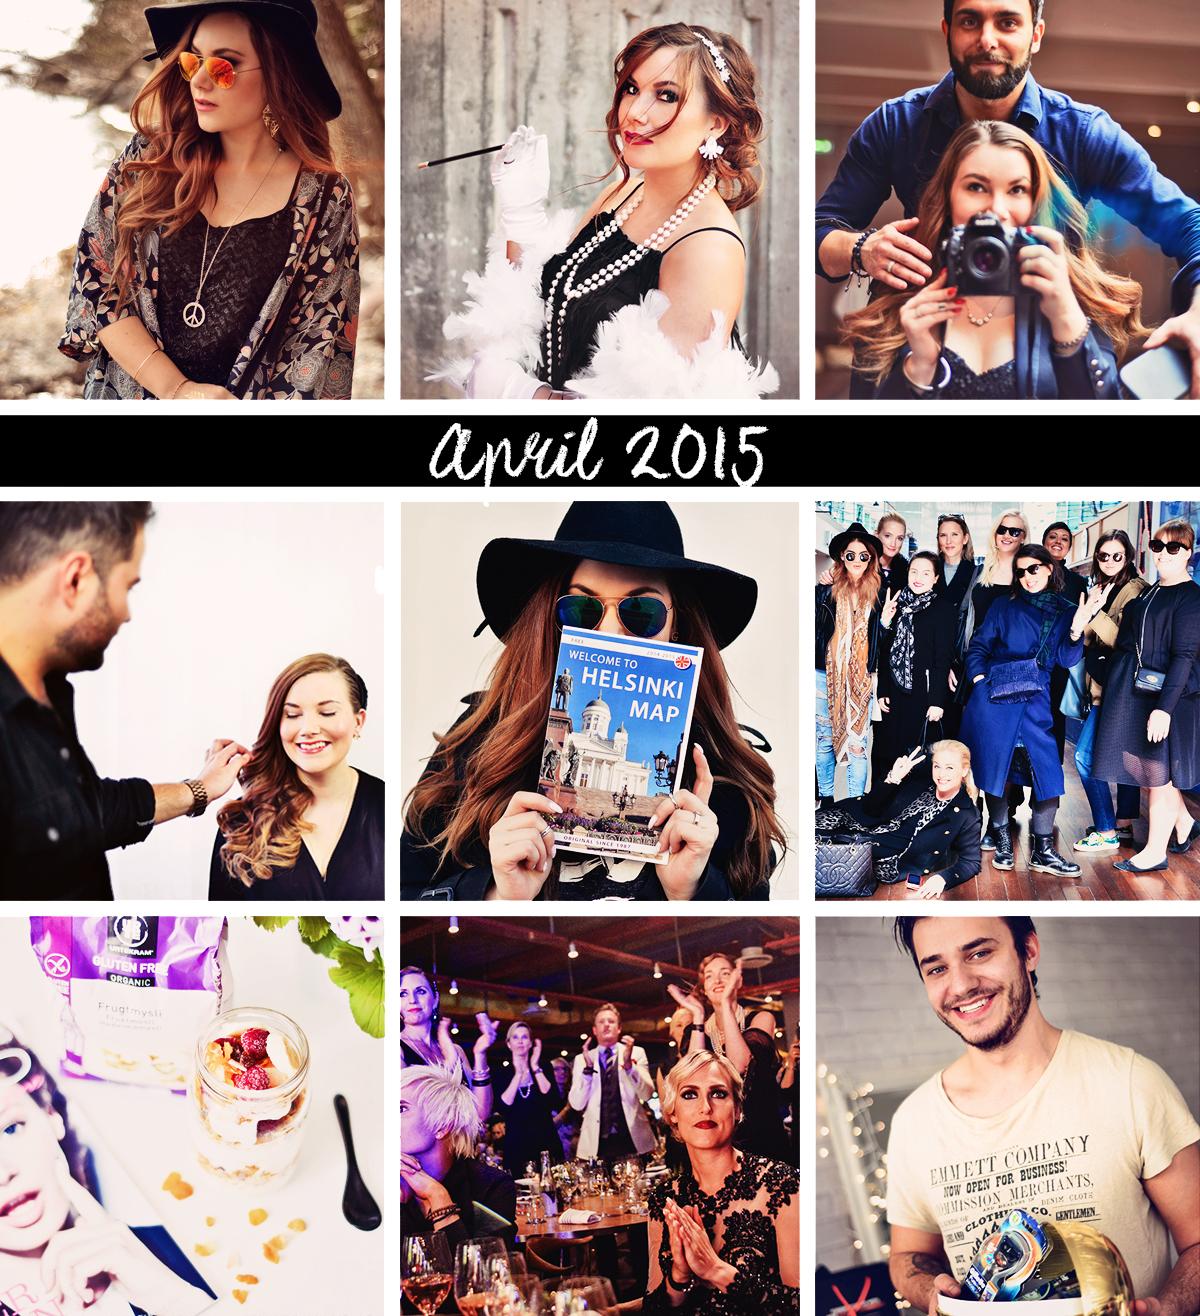 Årsresumé - April 2015